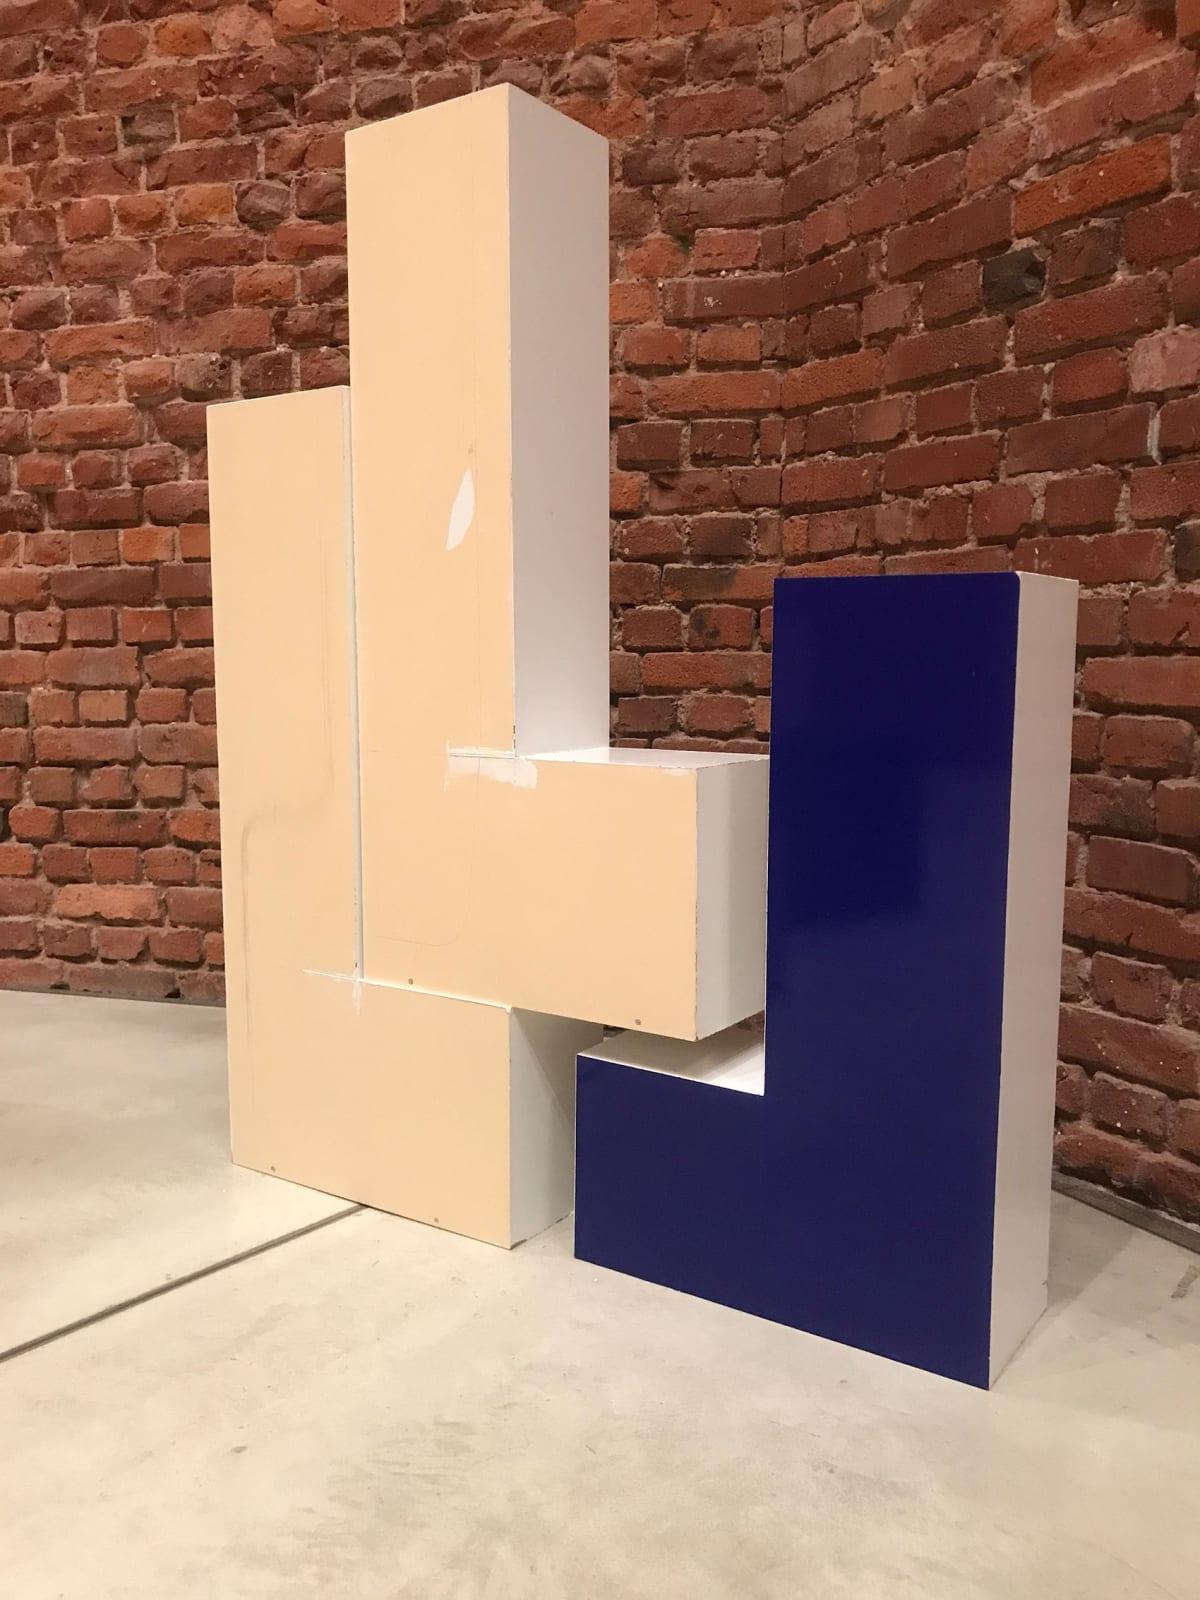 christian henkel, munchies art club, art platform, viewing room, object